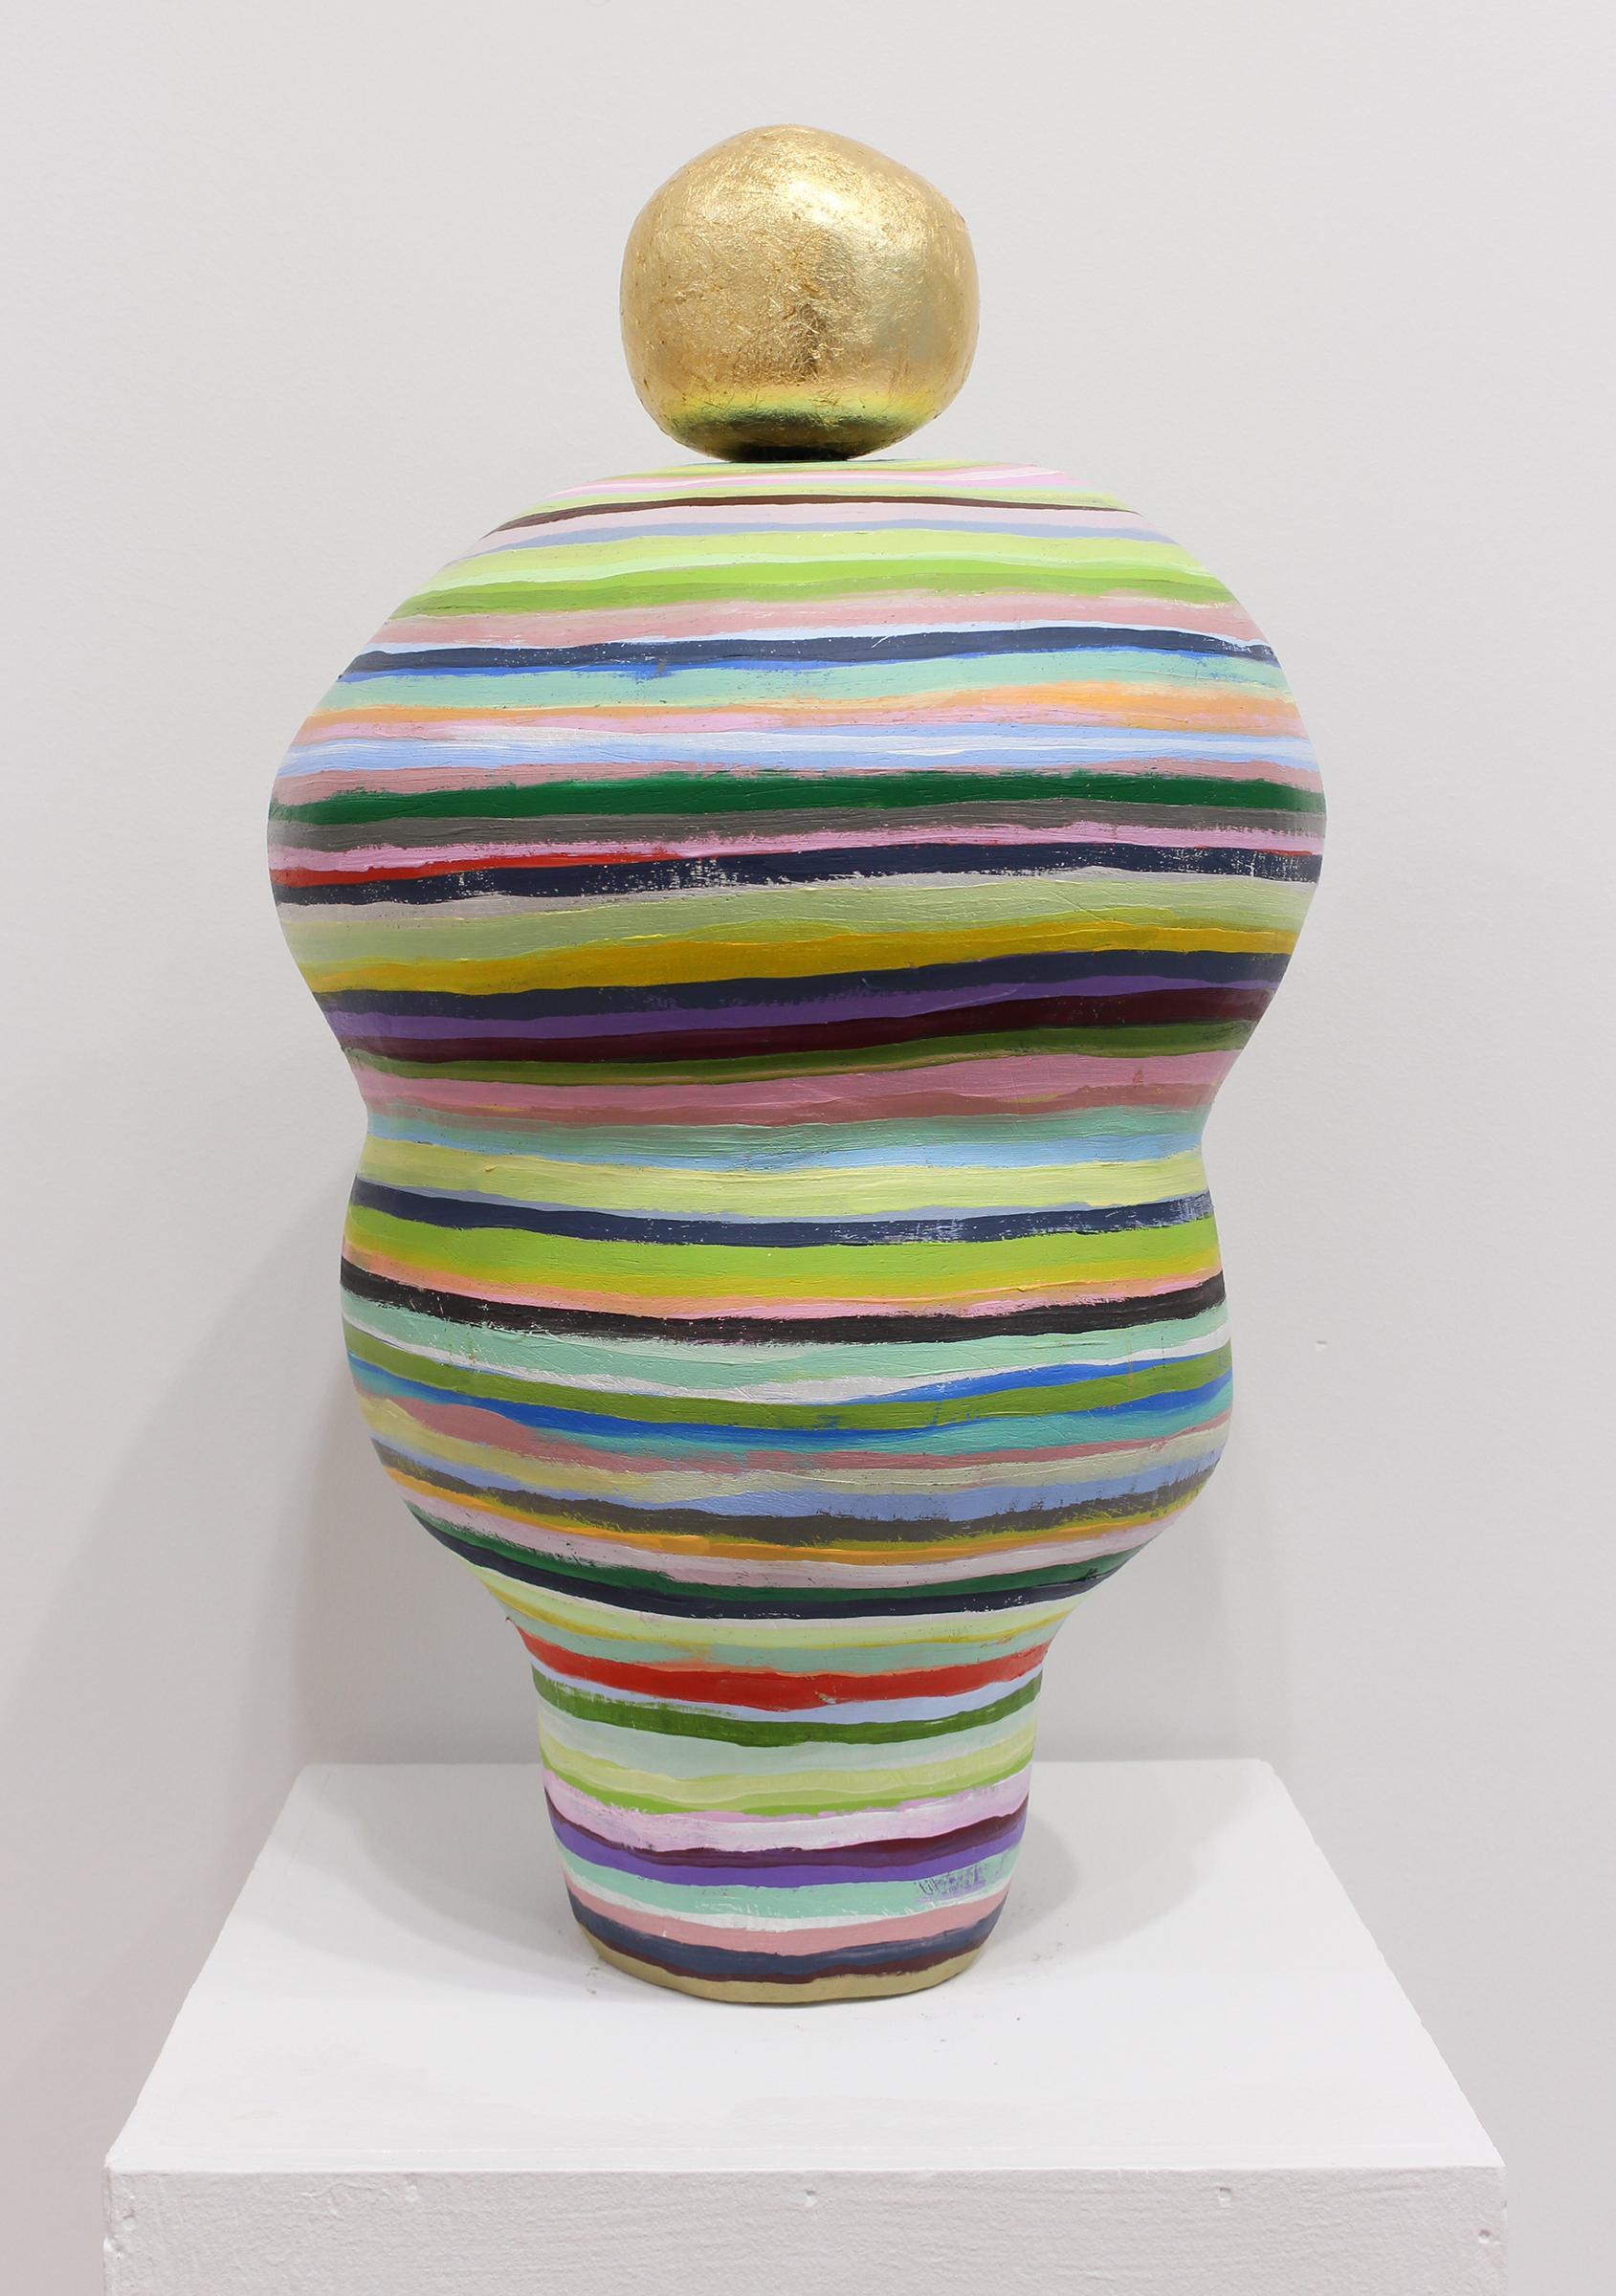 """Fanny"" - abstract sculpture - Barbara Hepworth"